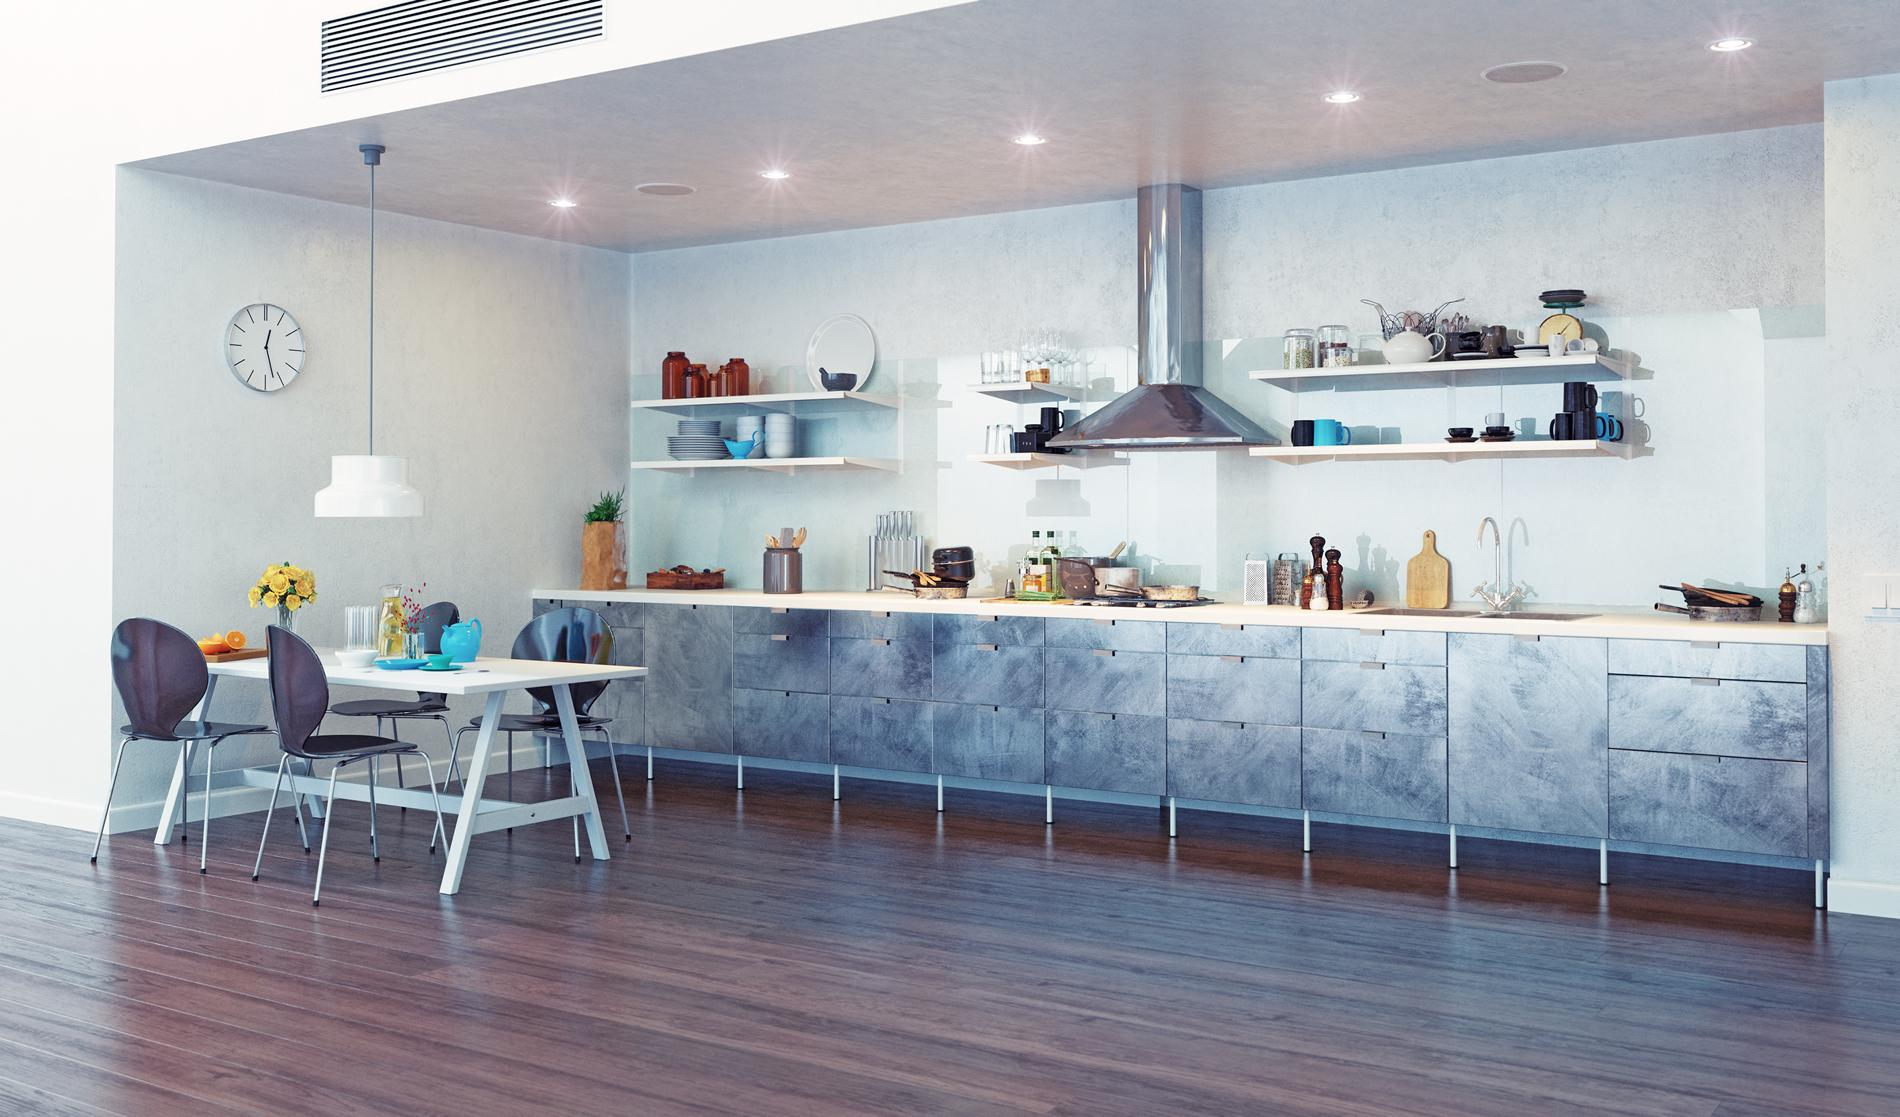 лакова натяжна стеля на кухні